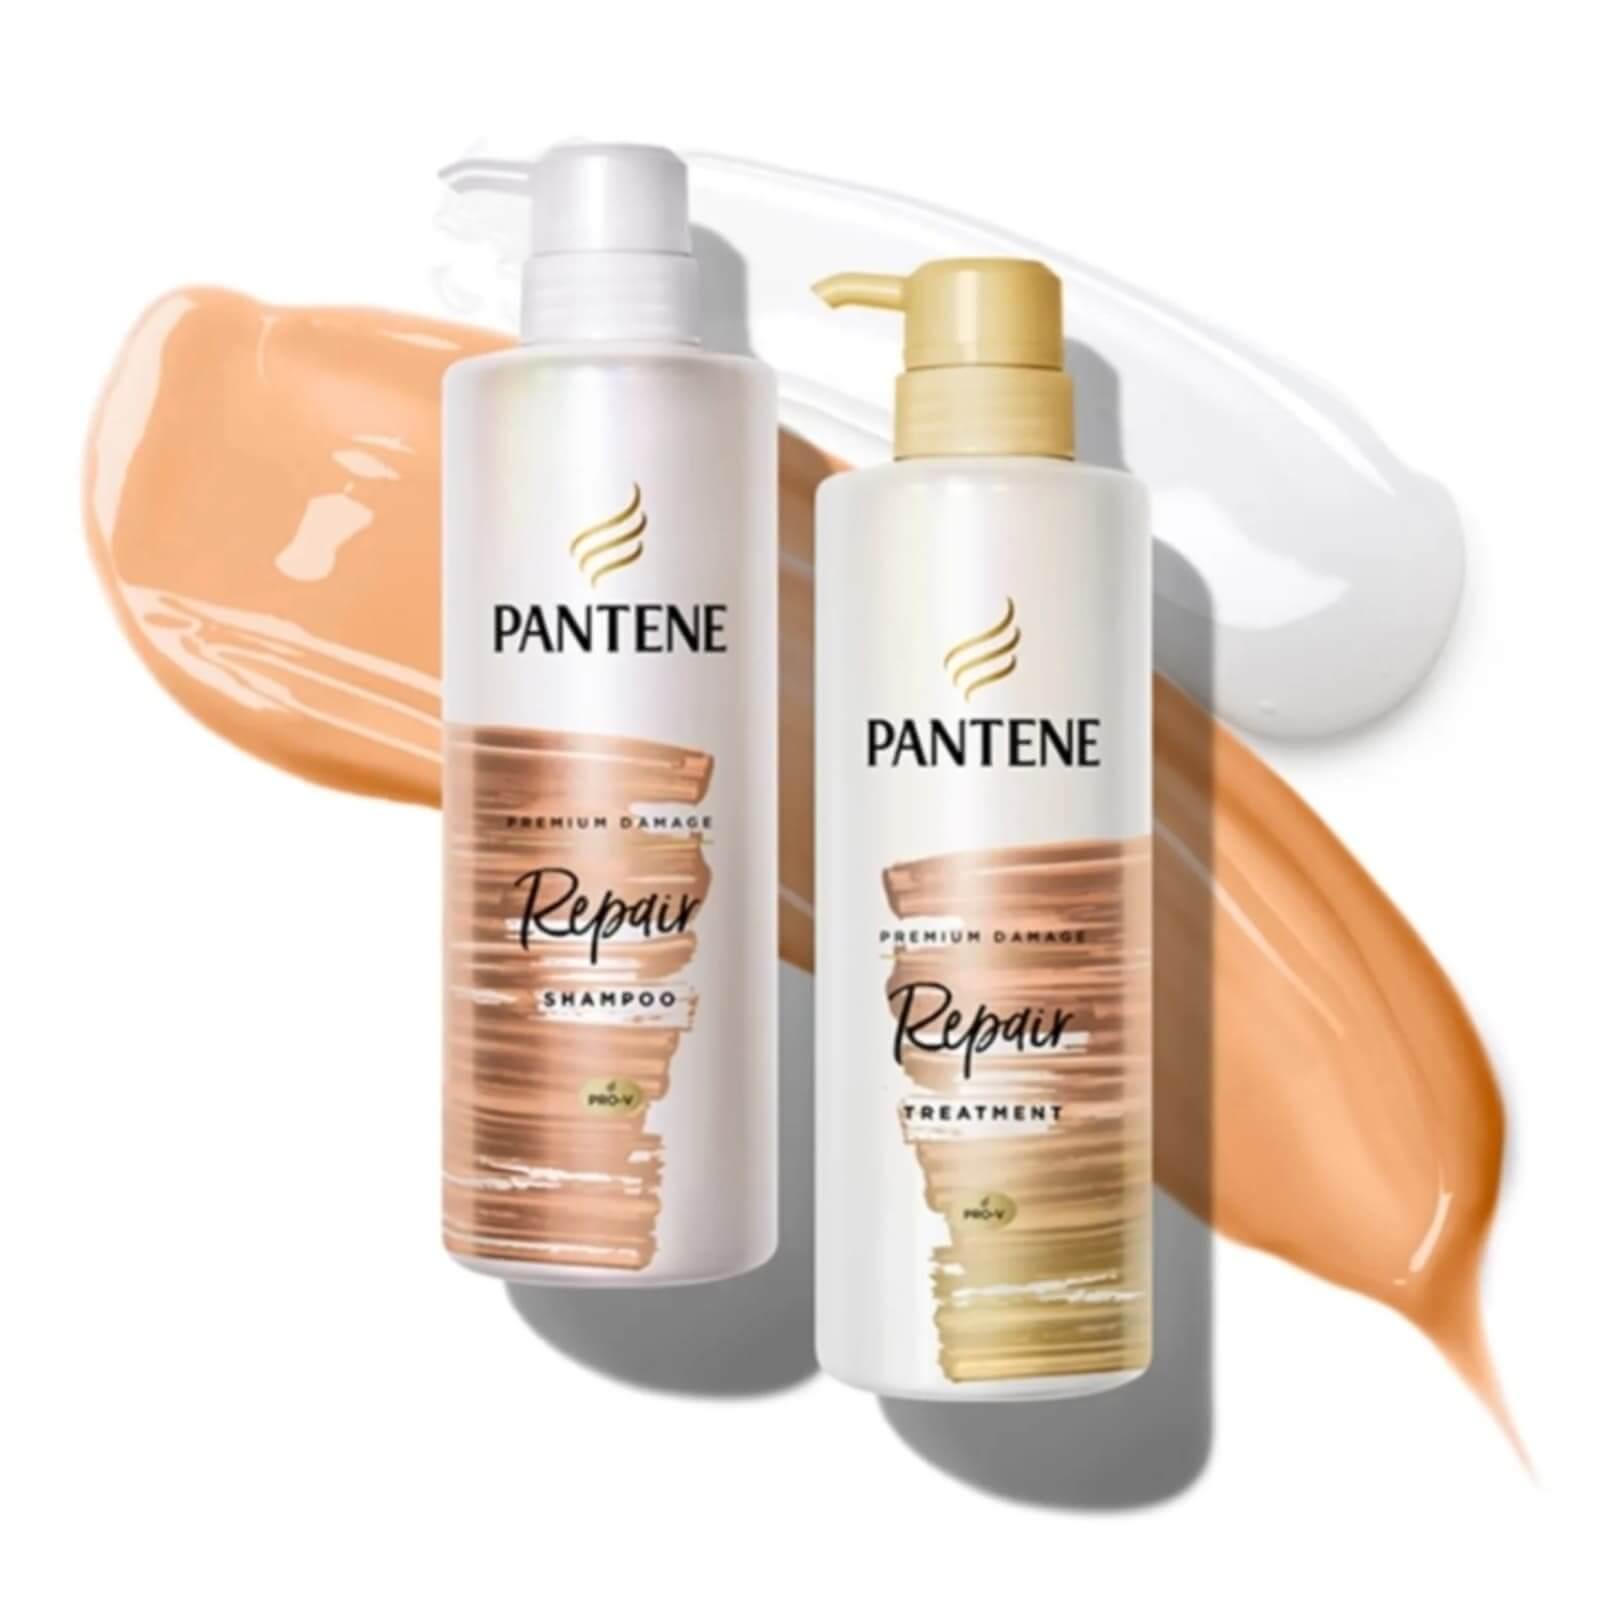 pnatene-damage-repair-shampoo